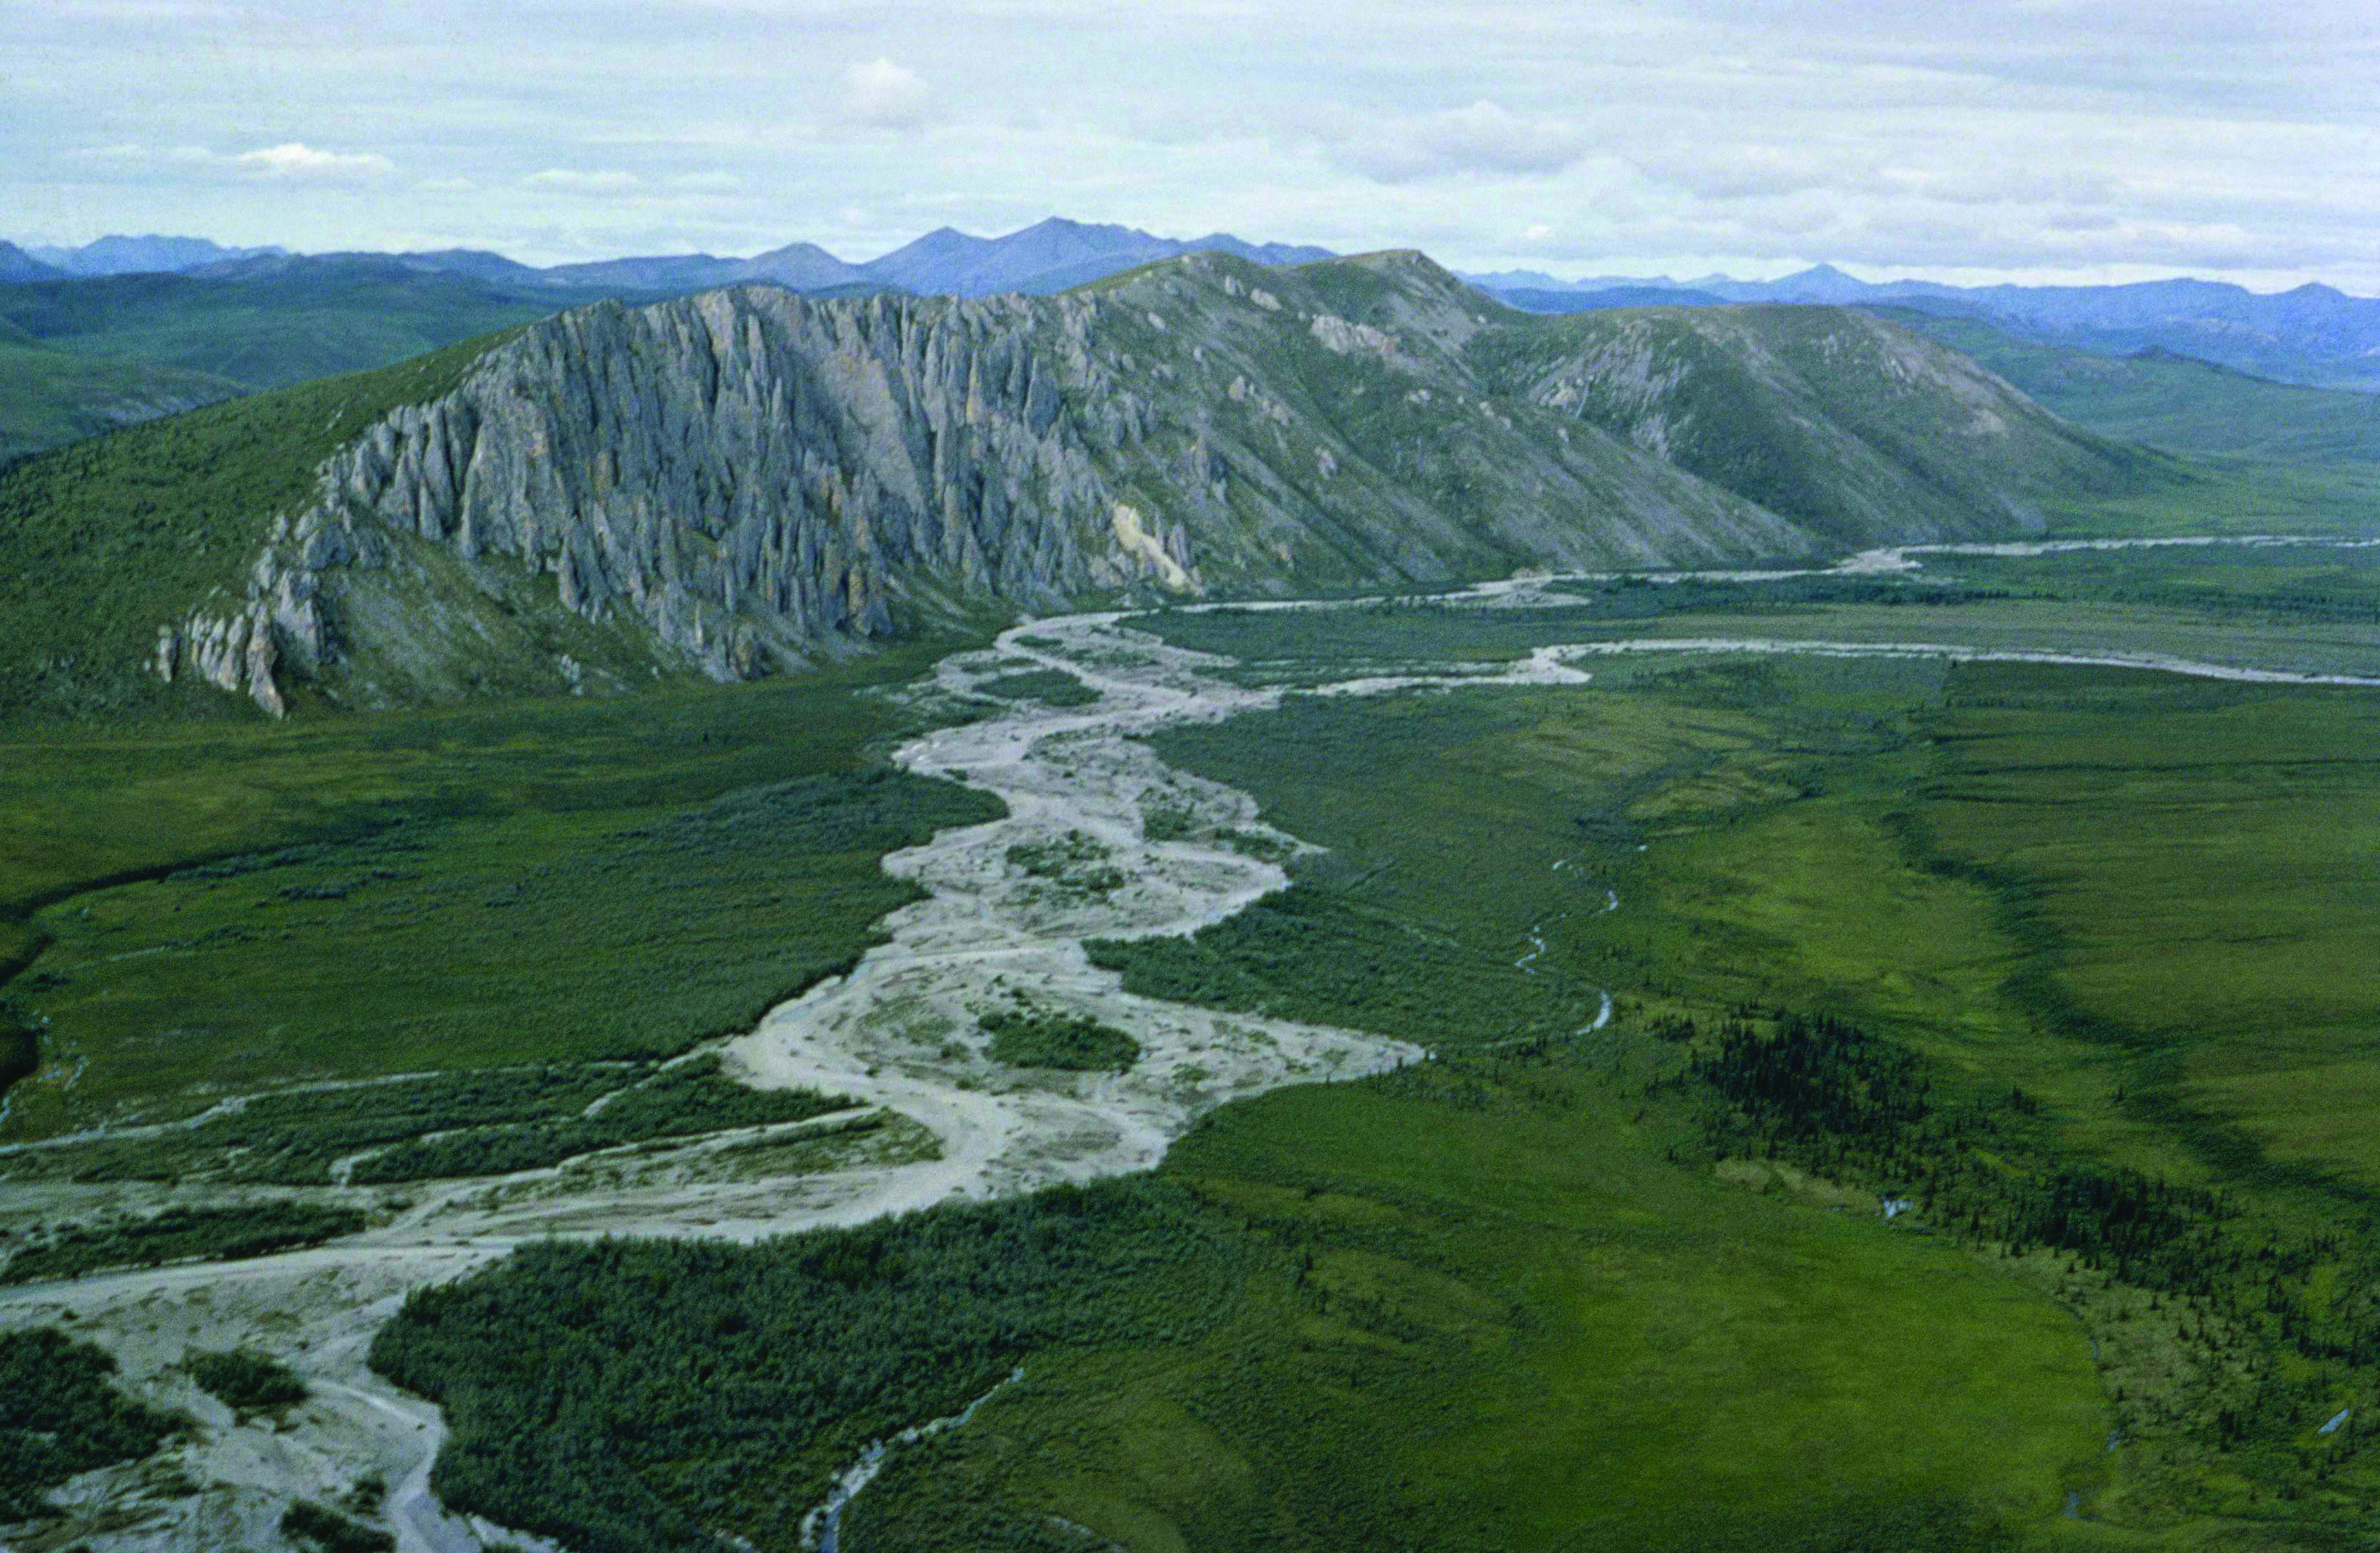 Oil ruins last and largest wildlife refuge